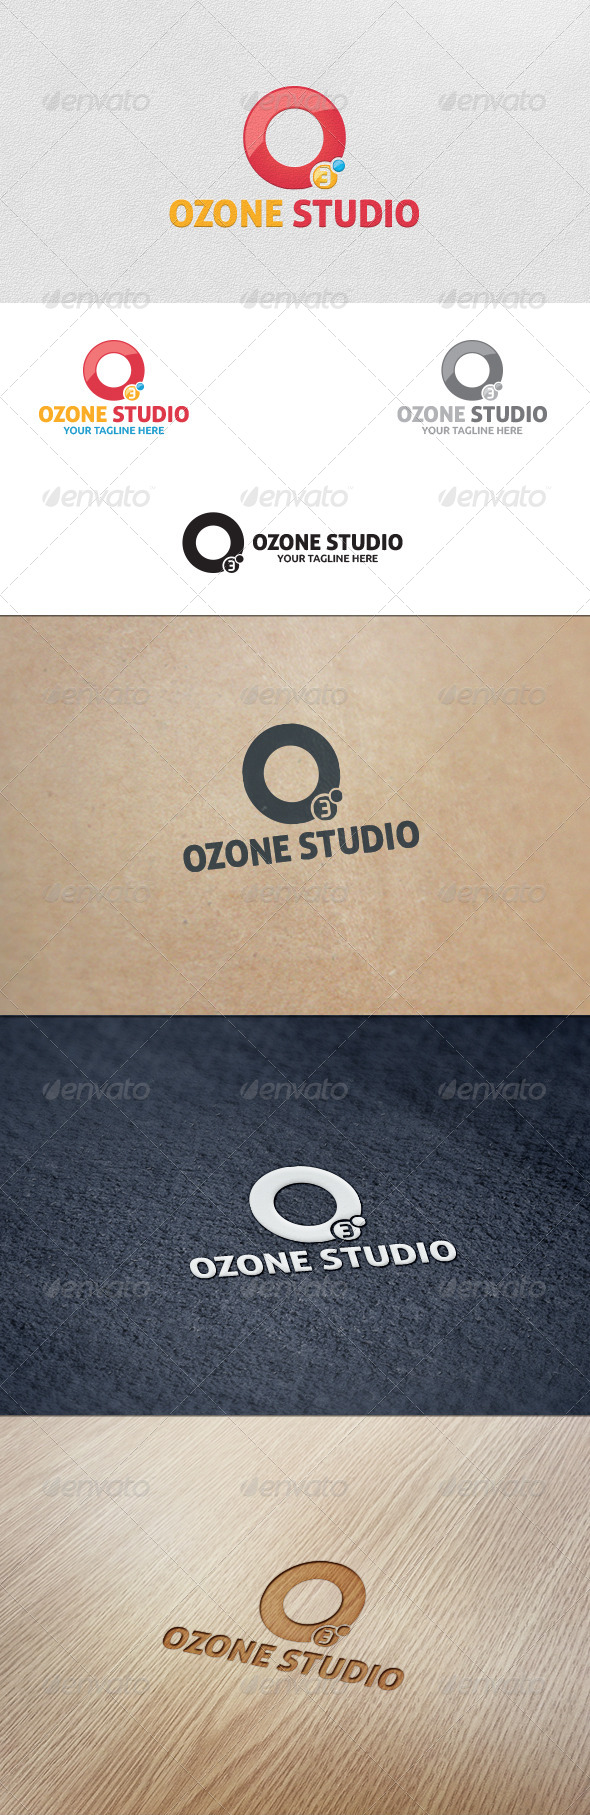 Ozone Studio Logo Template